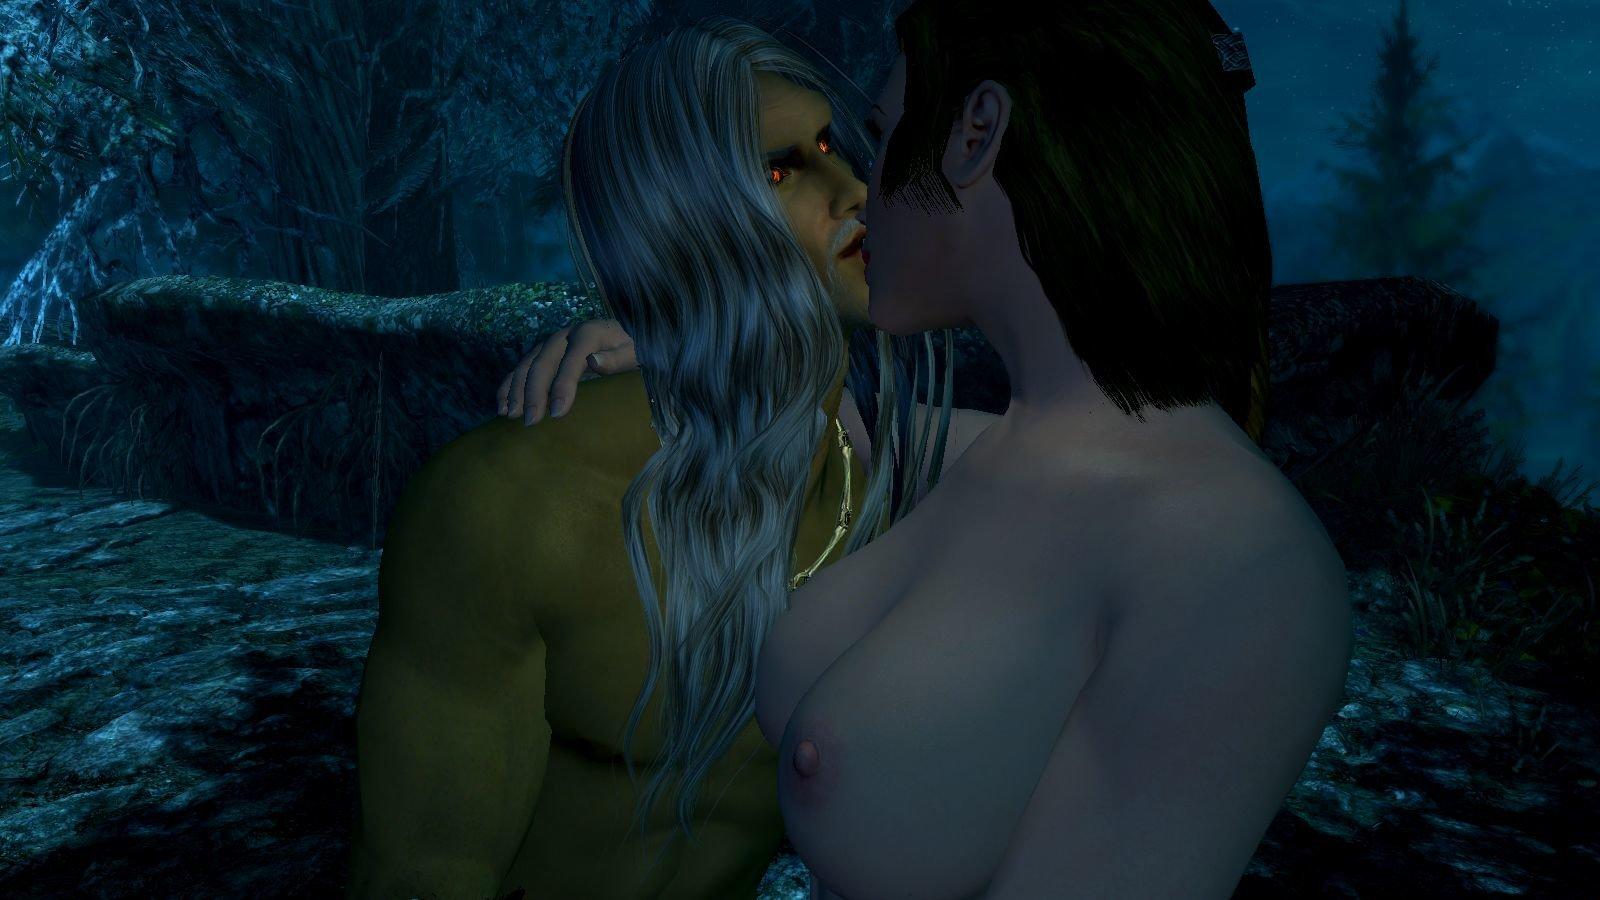 Поцелуй бессмертного.. SkyrimSE (сборка 6.0)